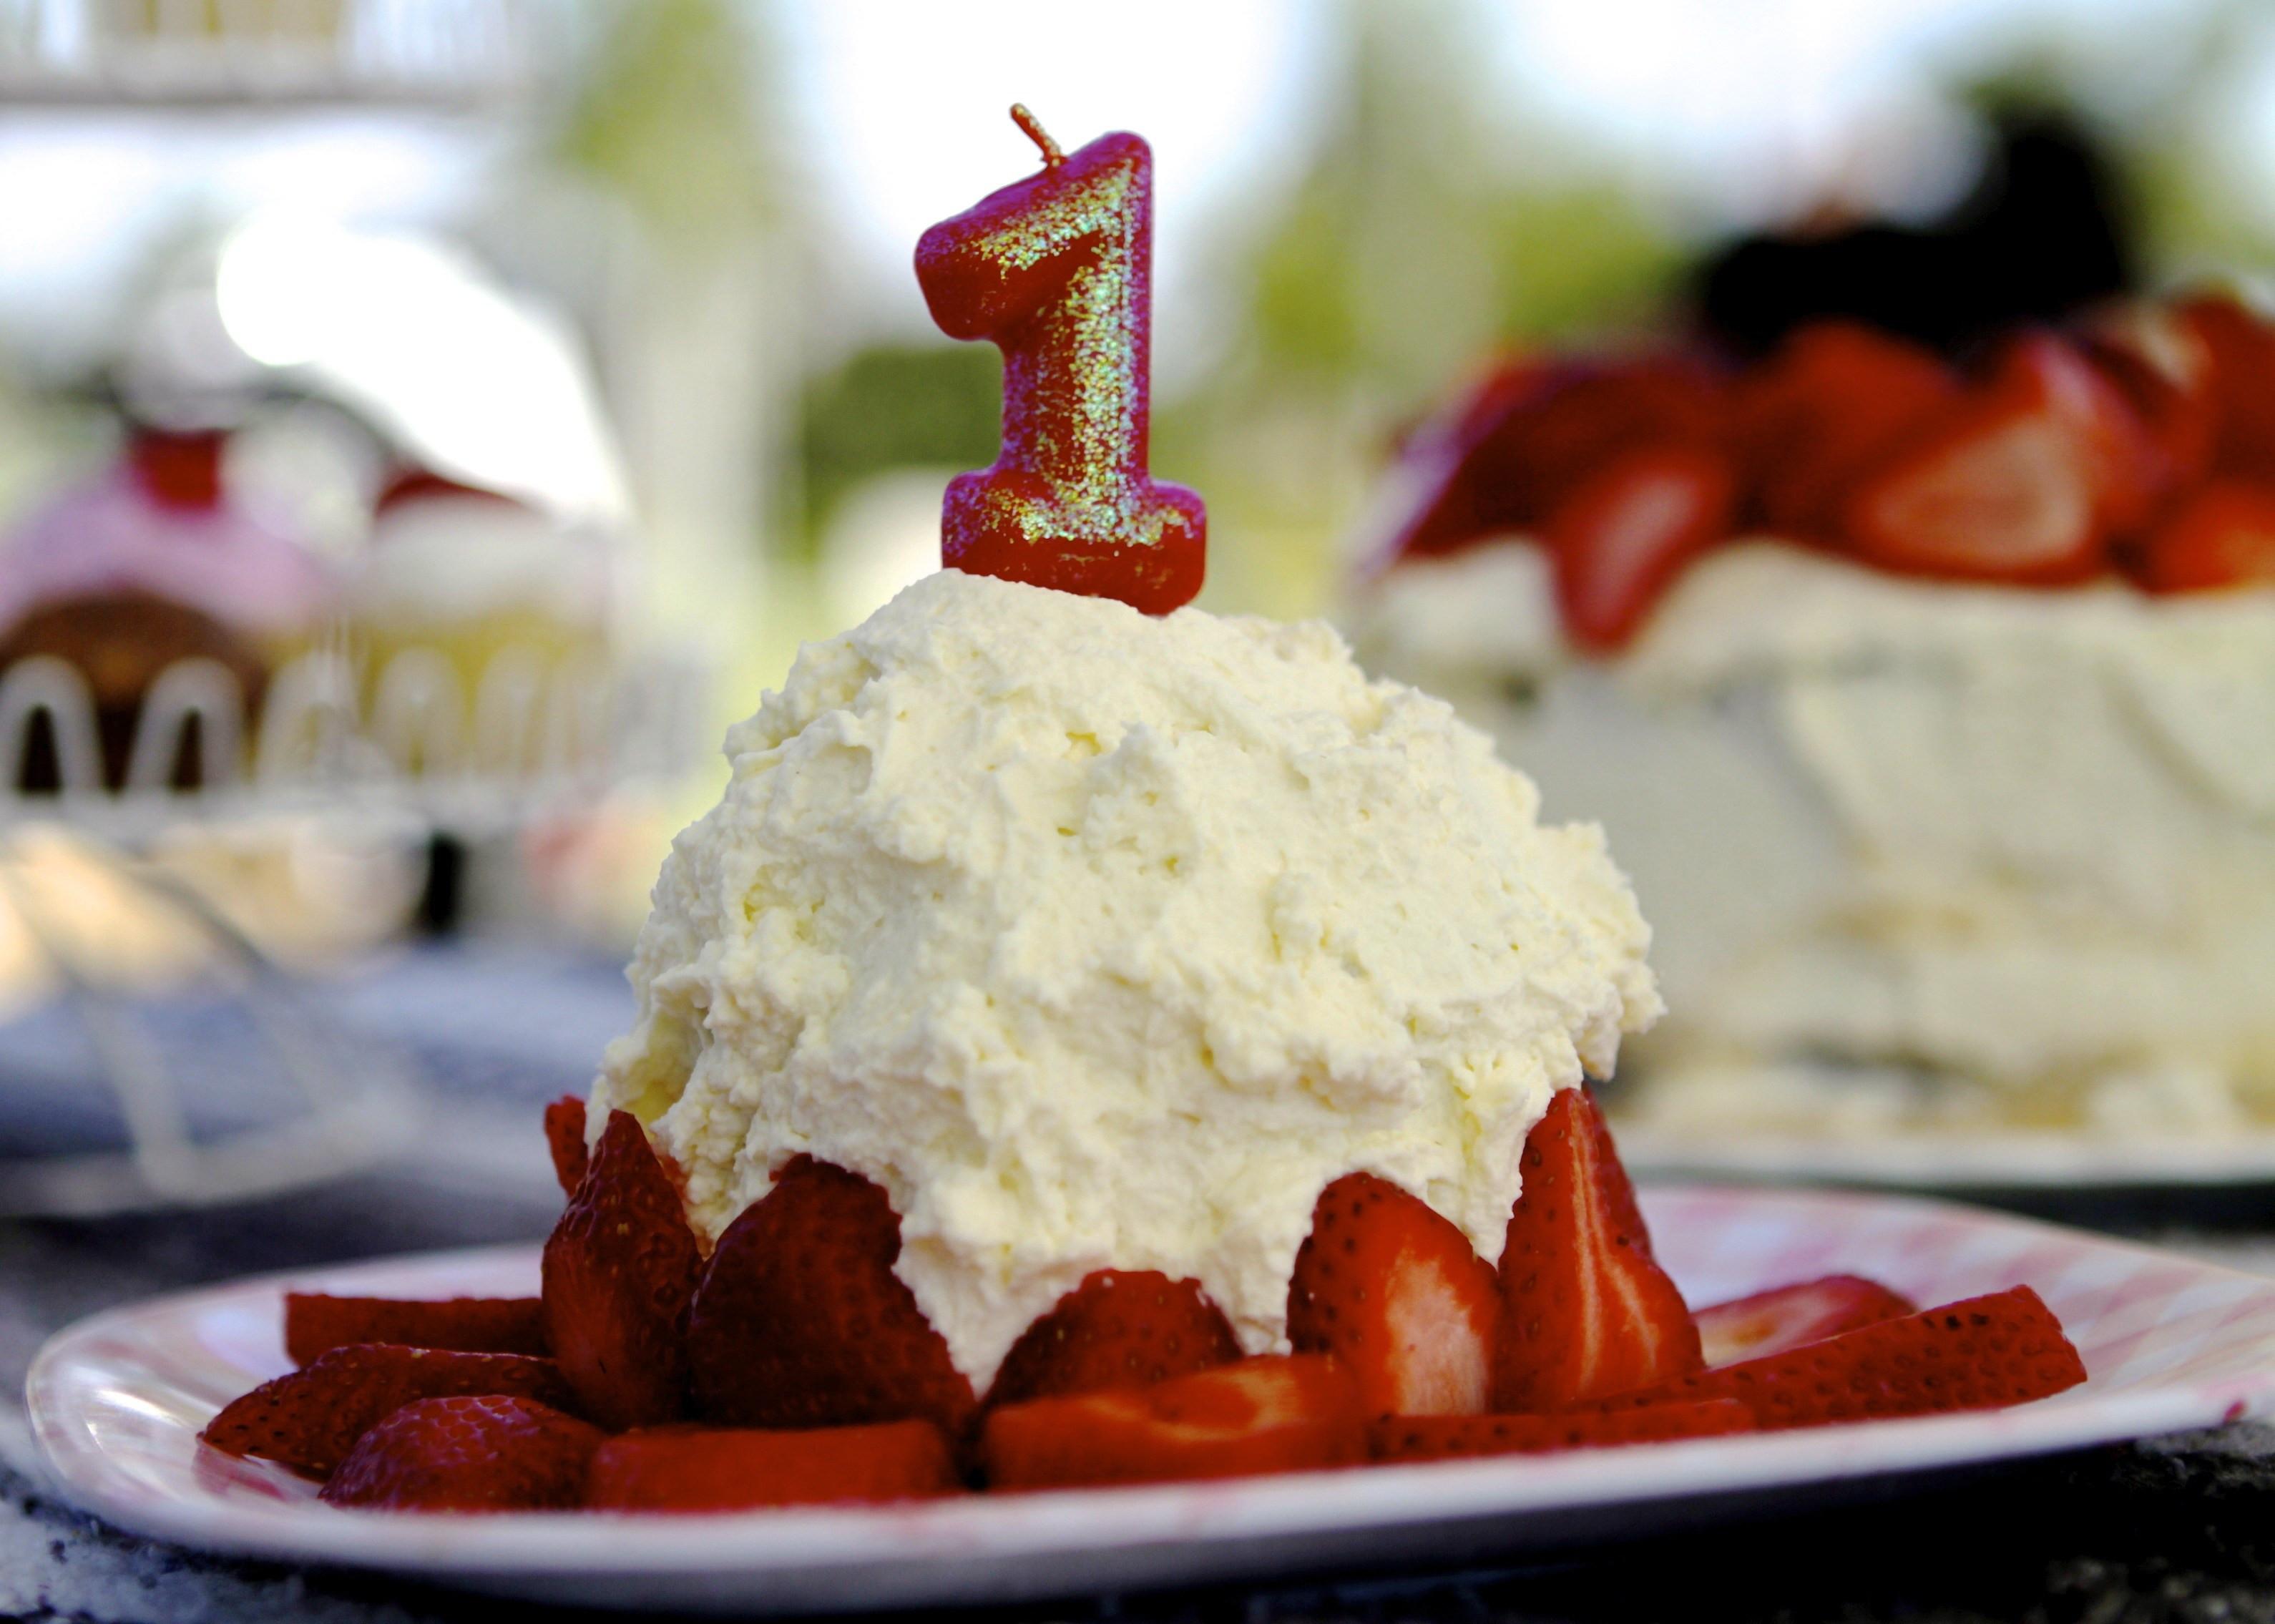 Healthy Baby Birthday Cake  Baby Bird s Banana Smash Cake A Healthier Option for a